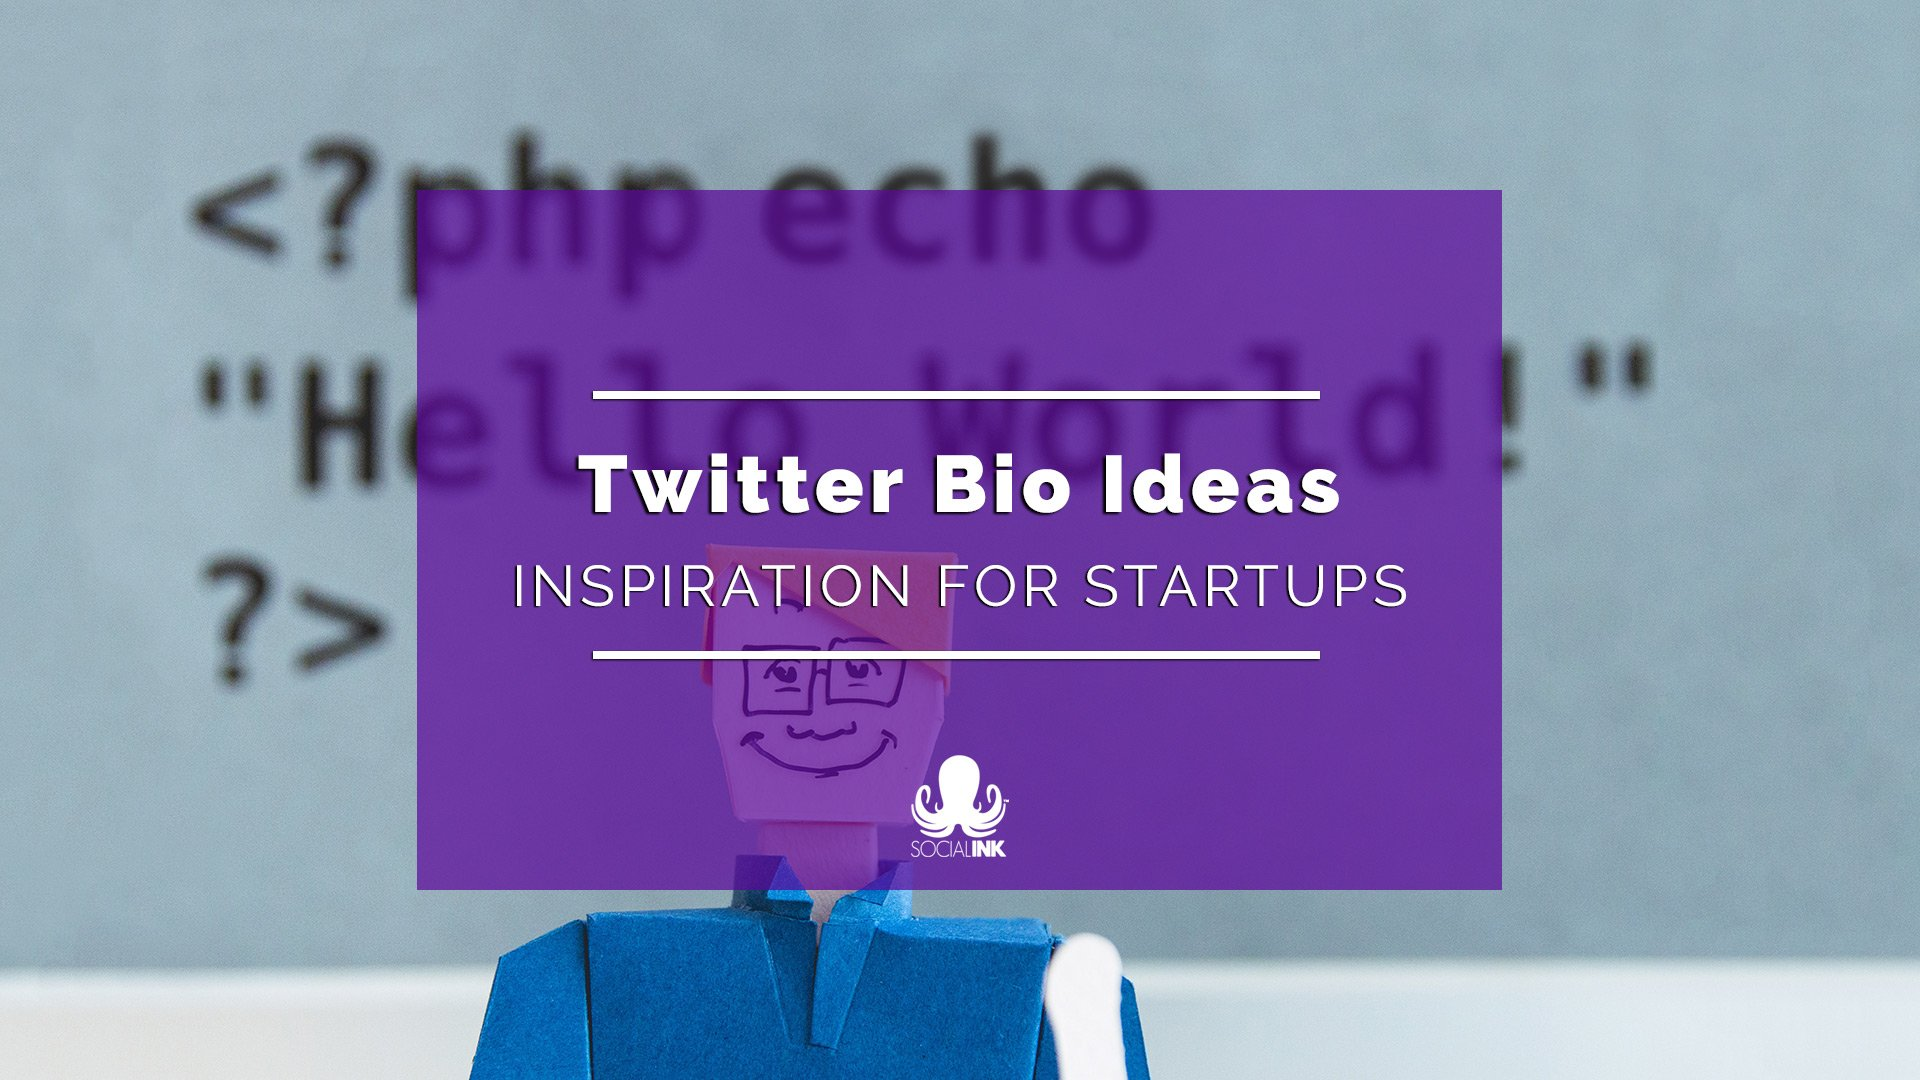 Twitter Bio Ideas for Startups